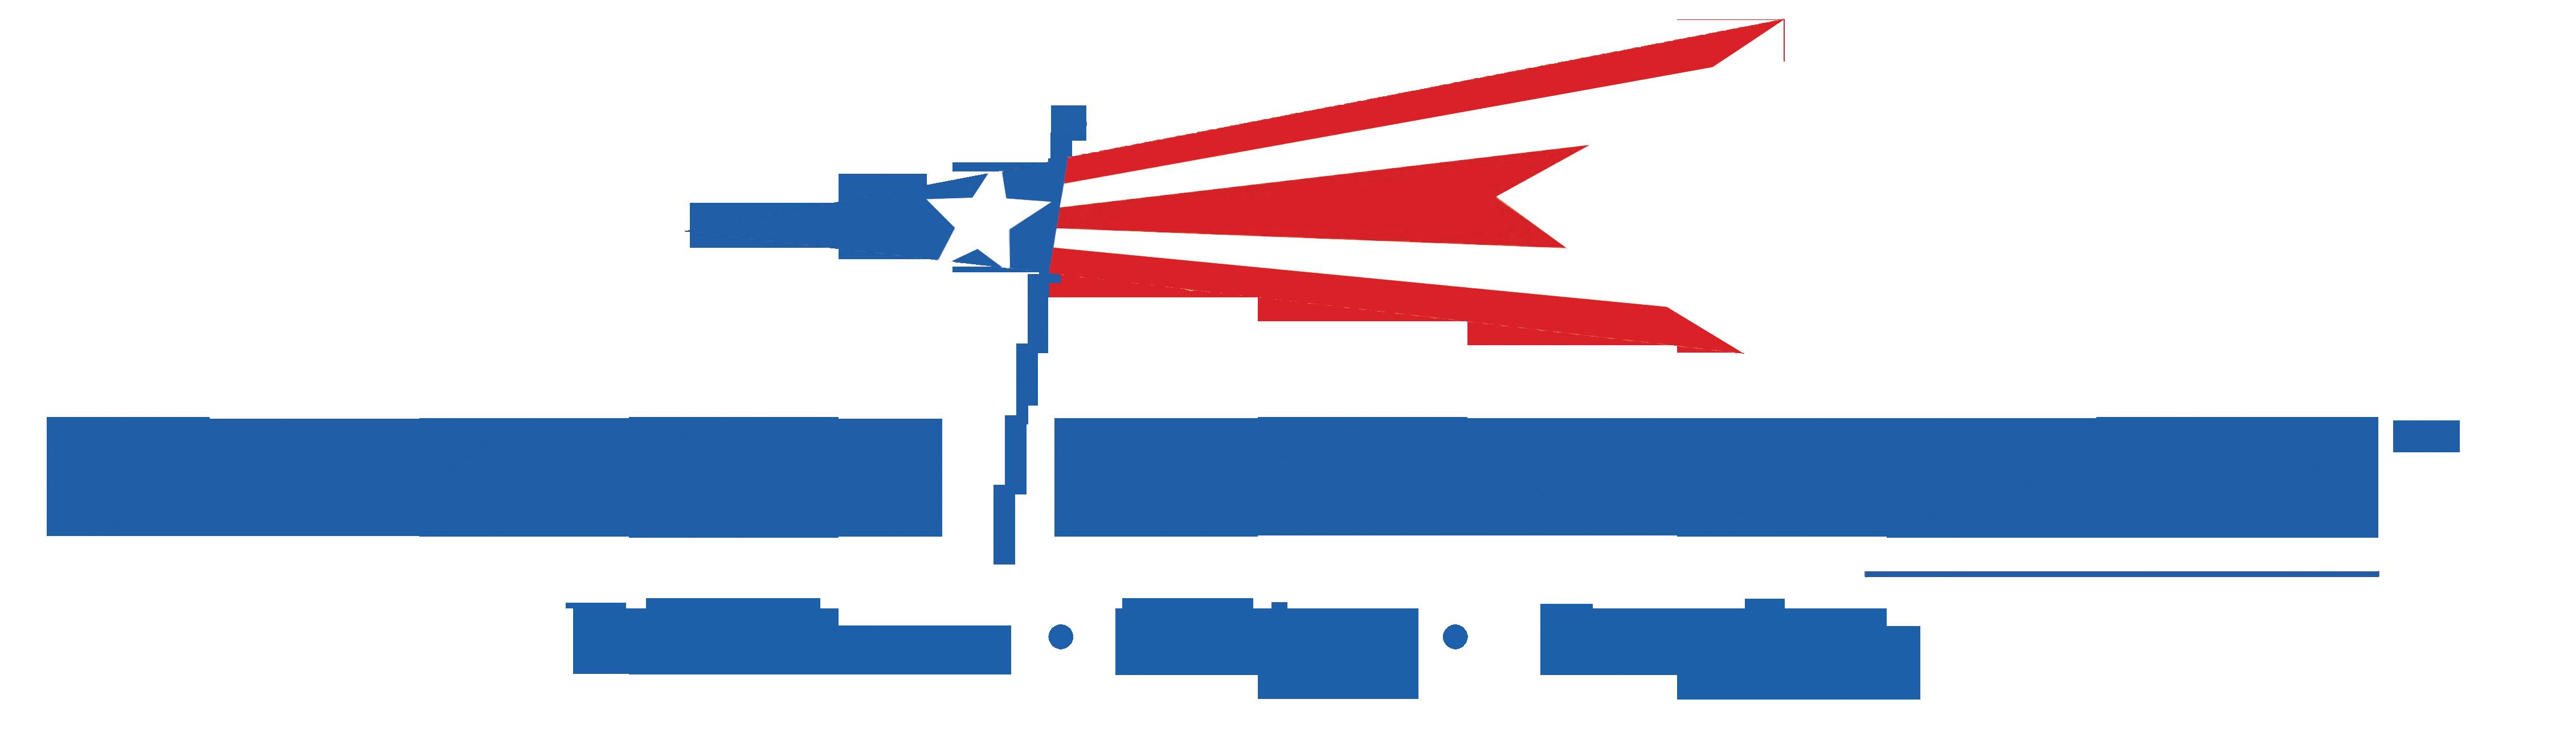 Replacement Windows Cincinnati OH | Columbus | House Siding | Roofing